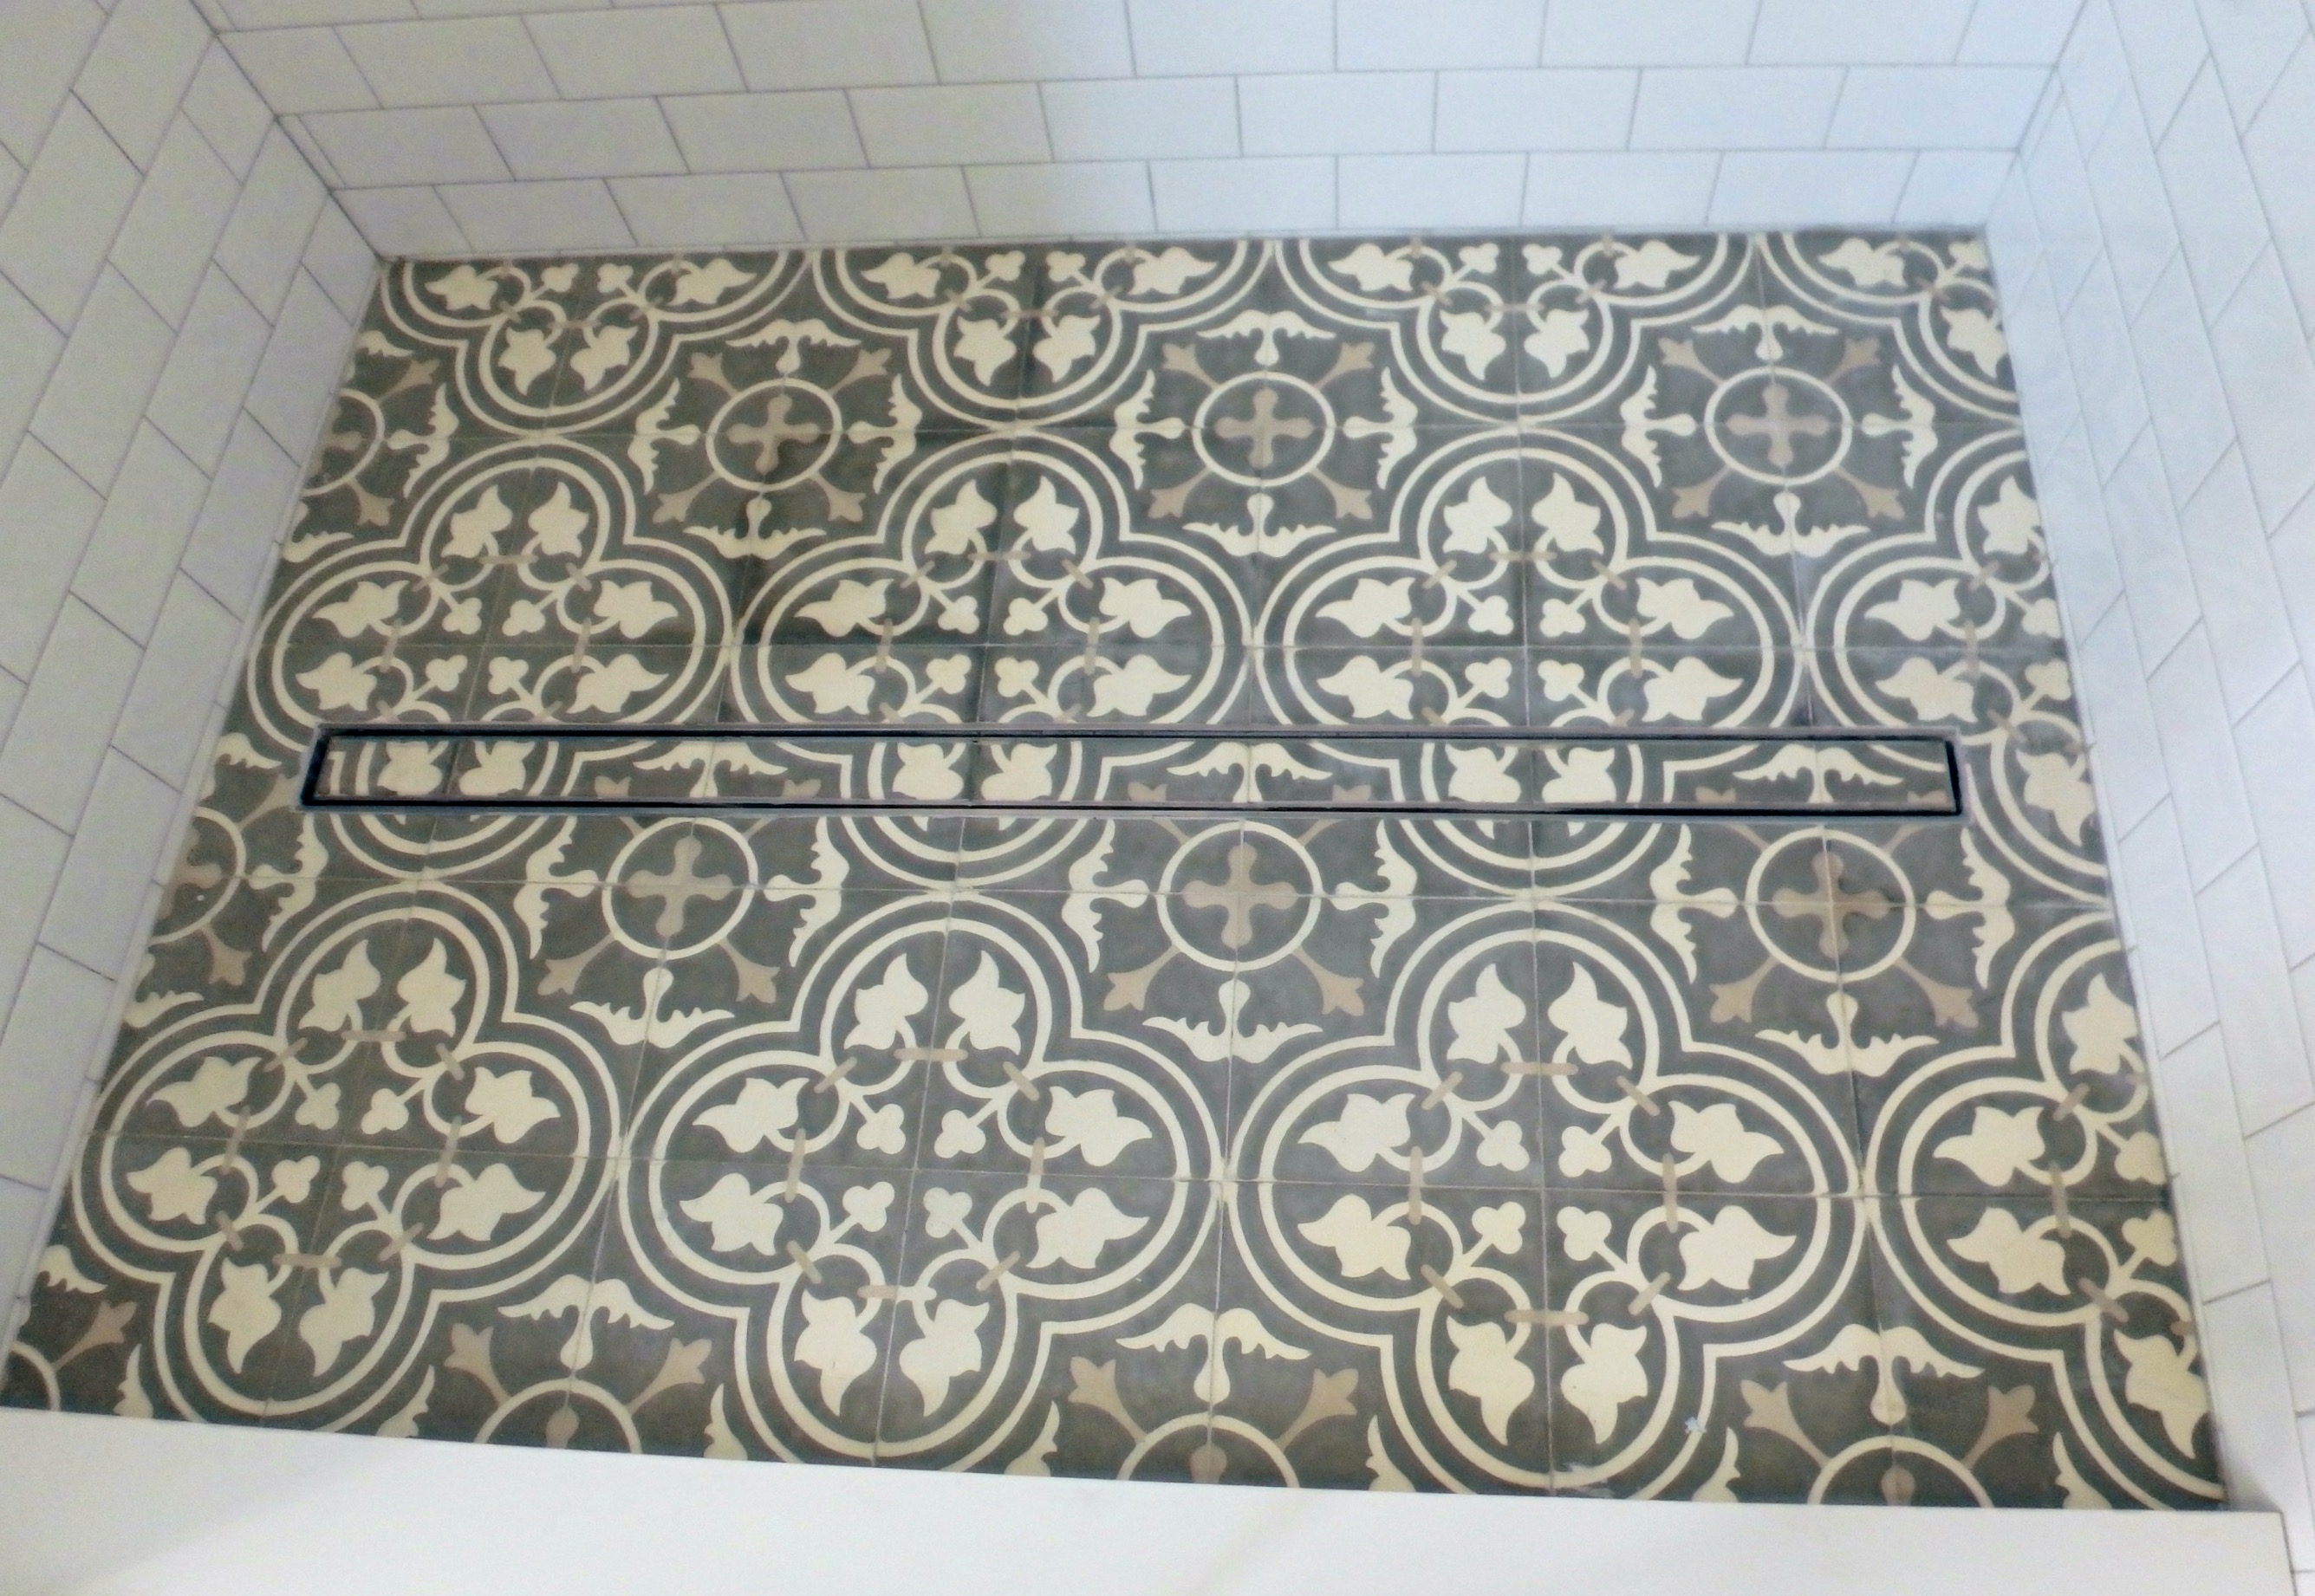 Linear Shower Drain with Custom Tile